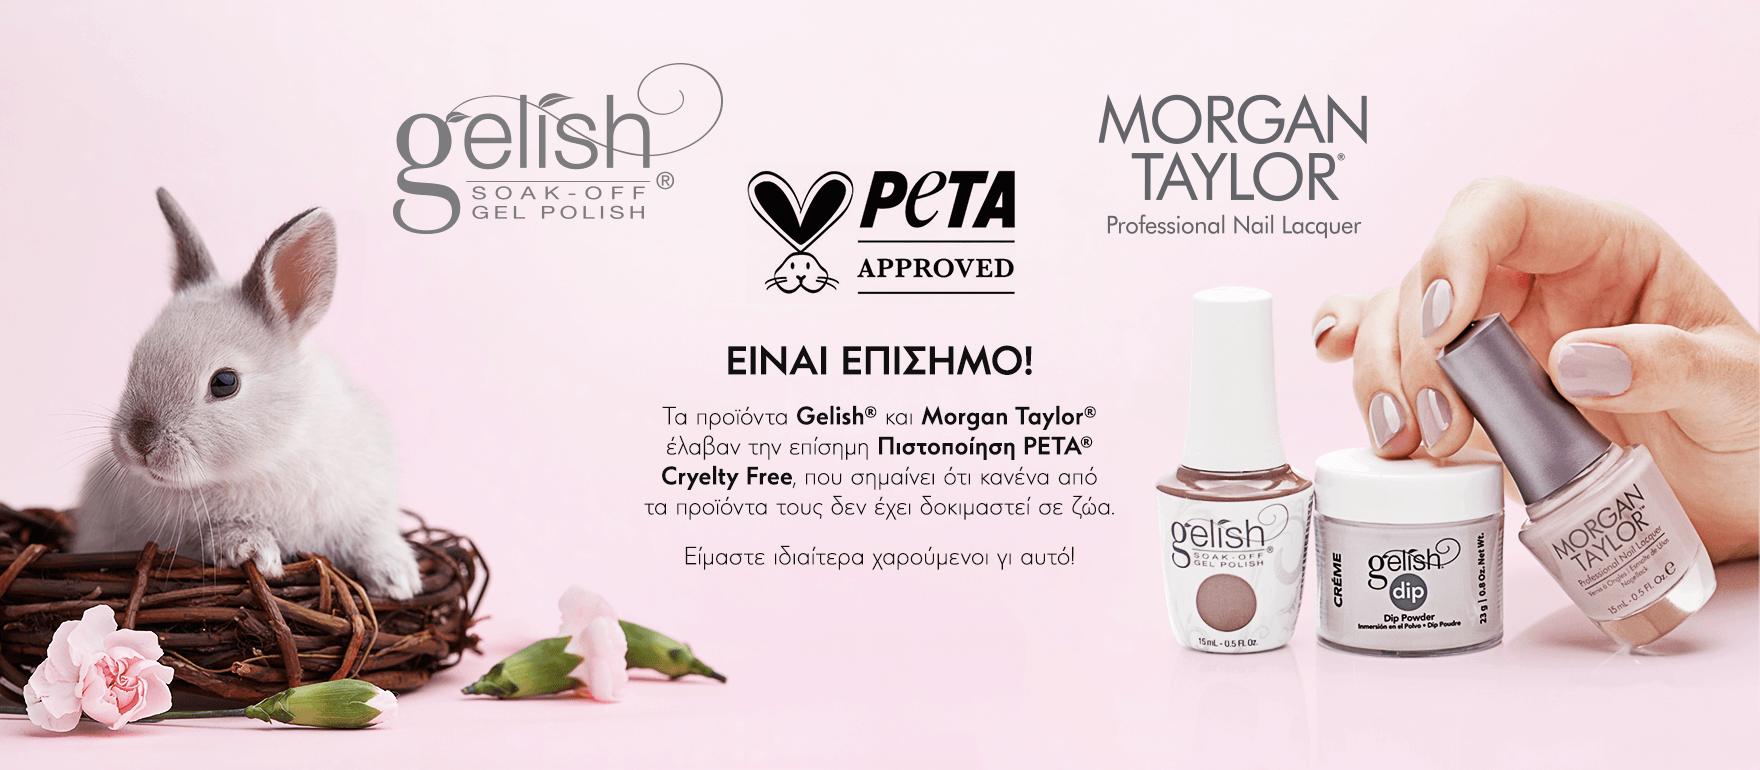 Gelish - Morgan Taylor PETA